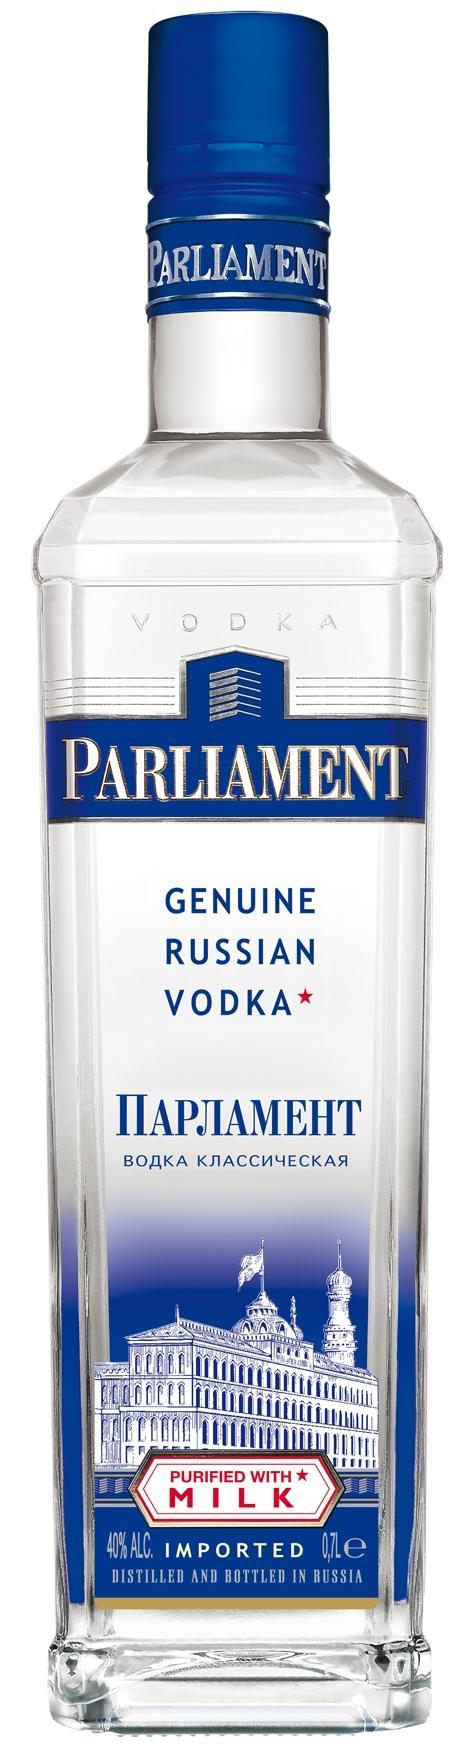 Parliament vodka #parliamentvodka #vodka #bottle